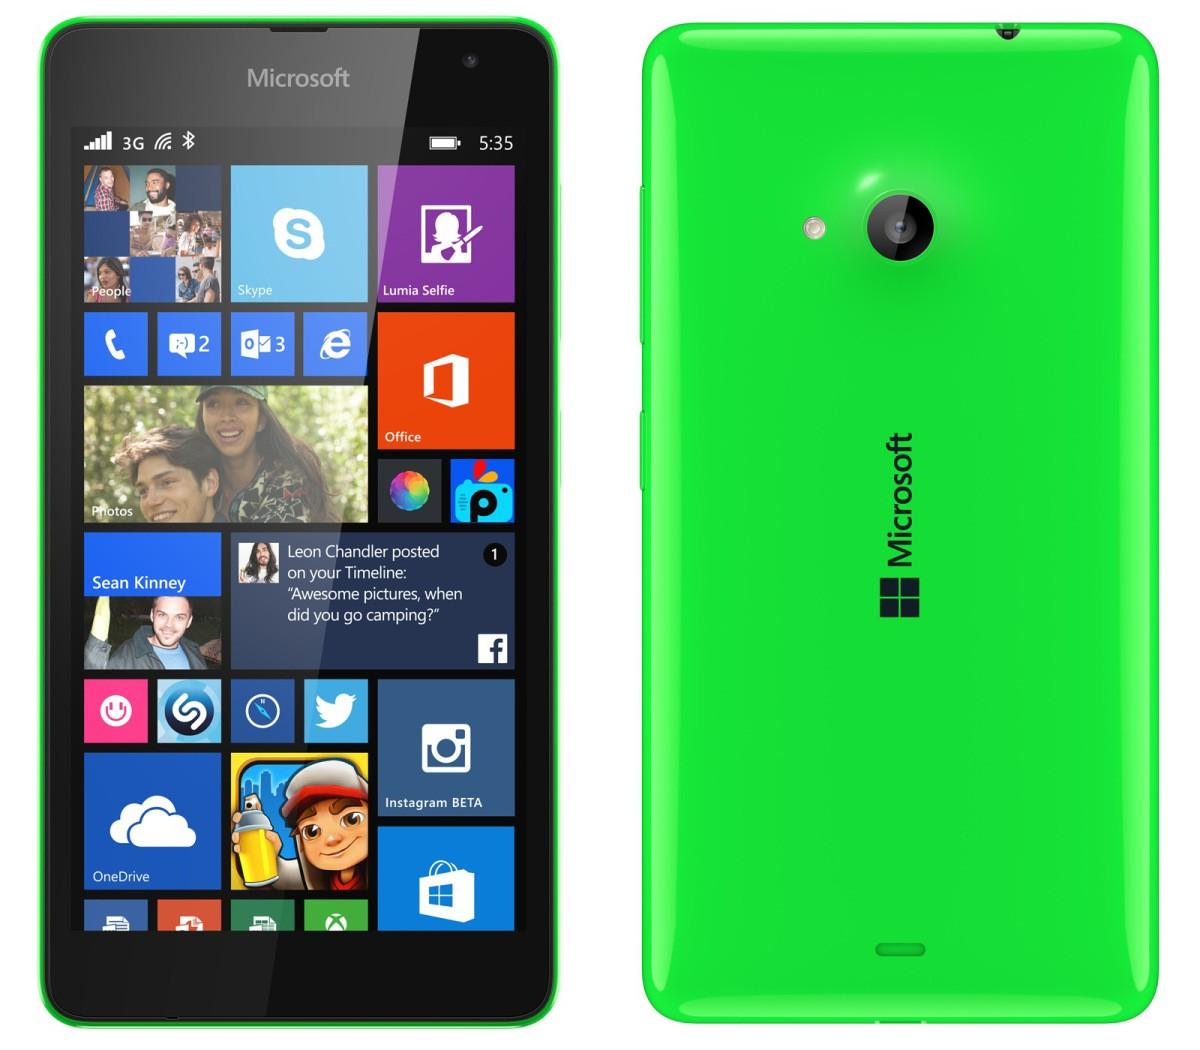 Microsoft Logo On The Back Of Lumia 535